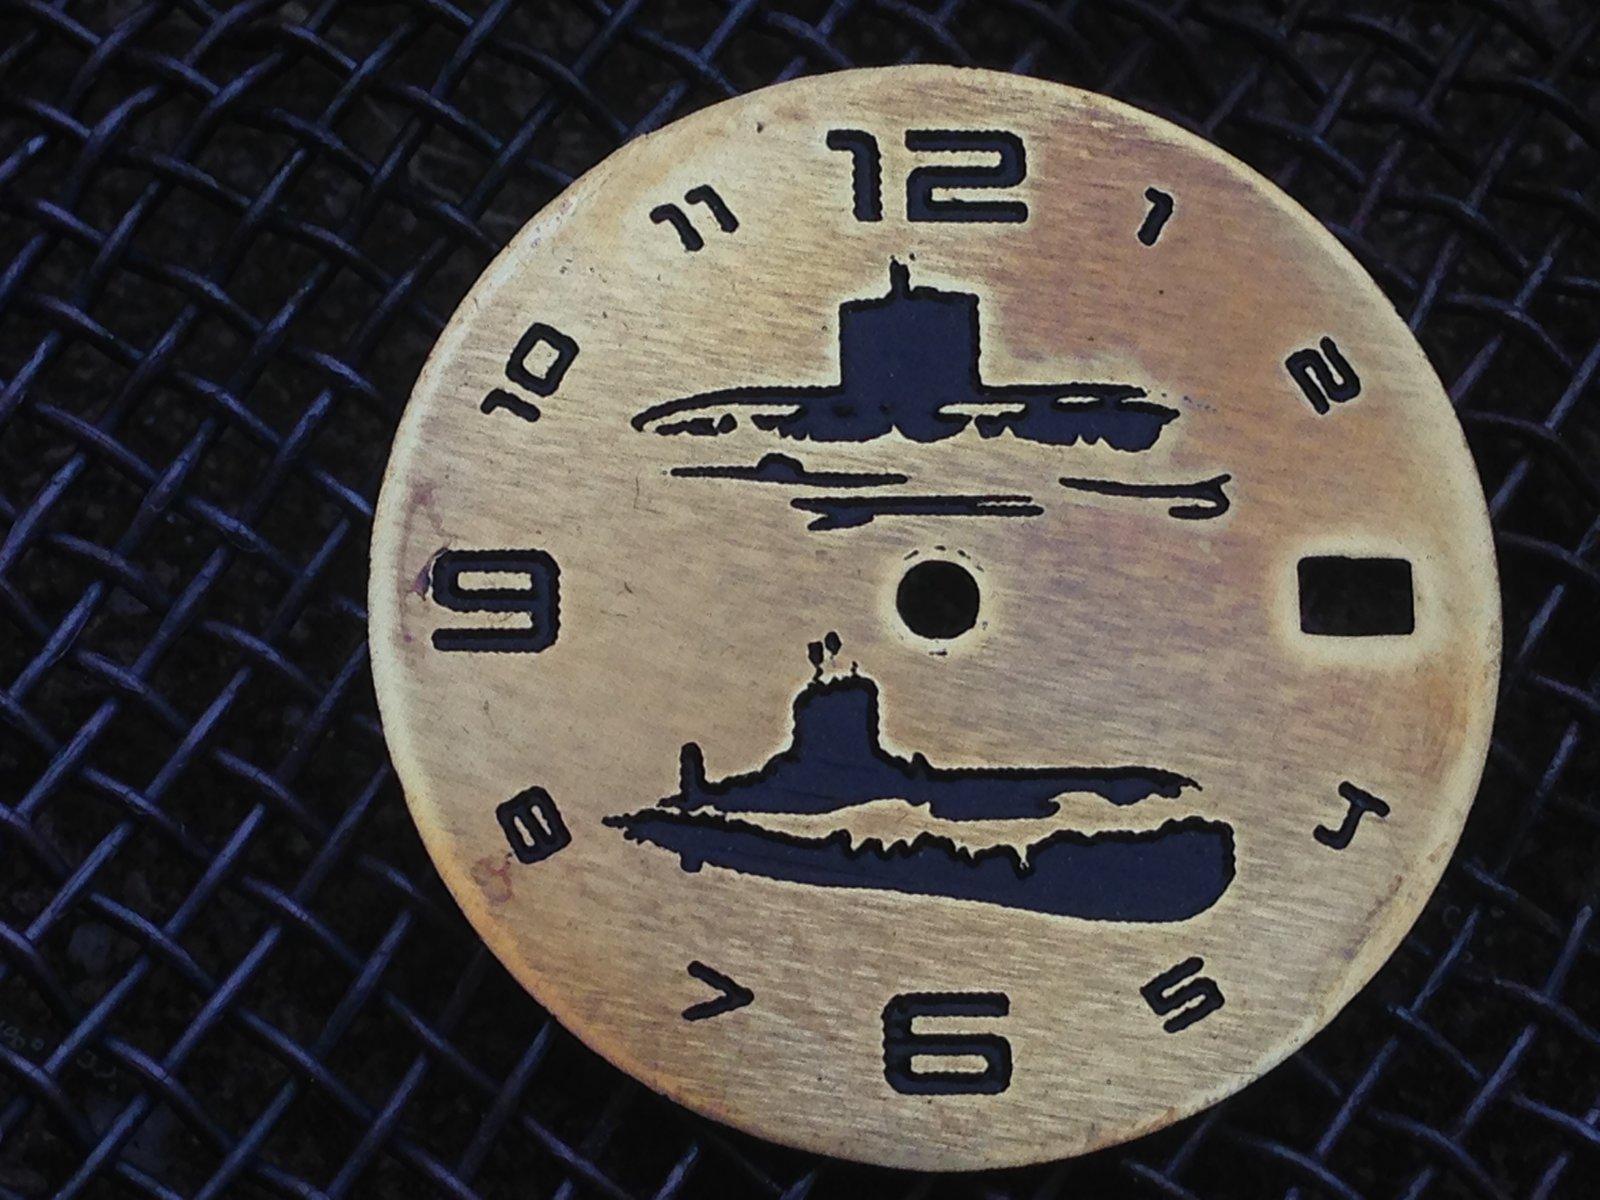 U-Boat for Seiko Vostok